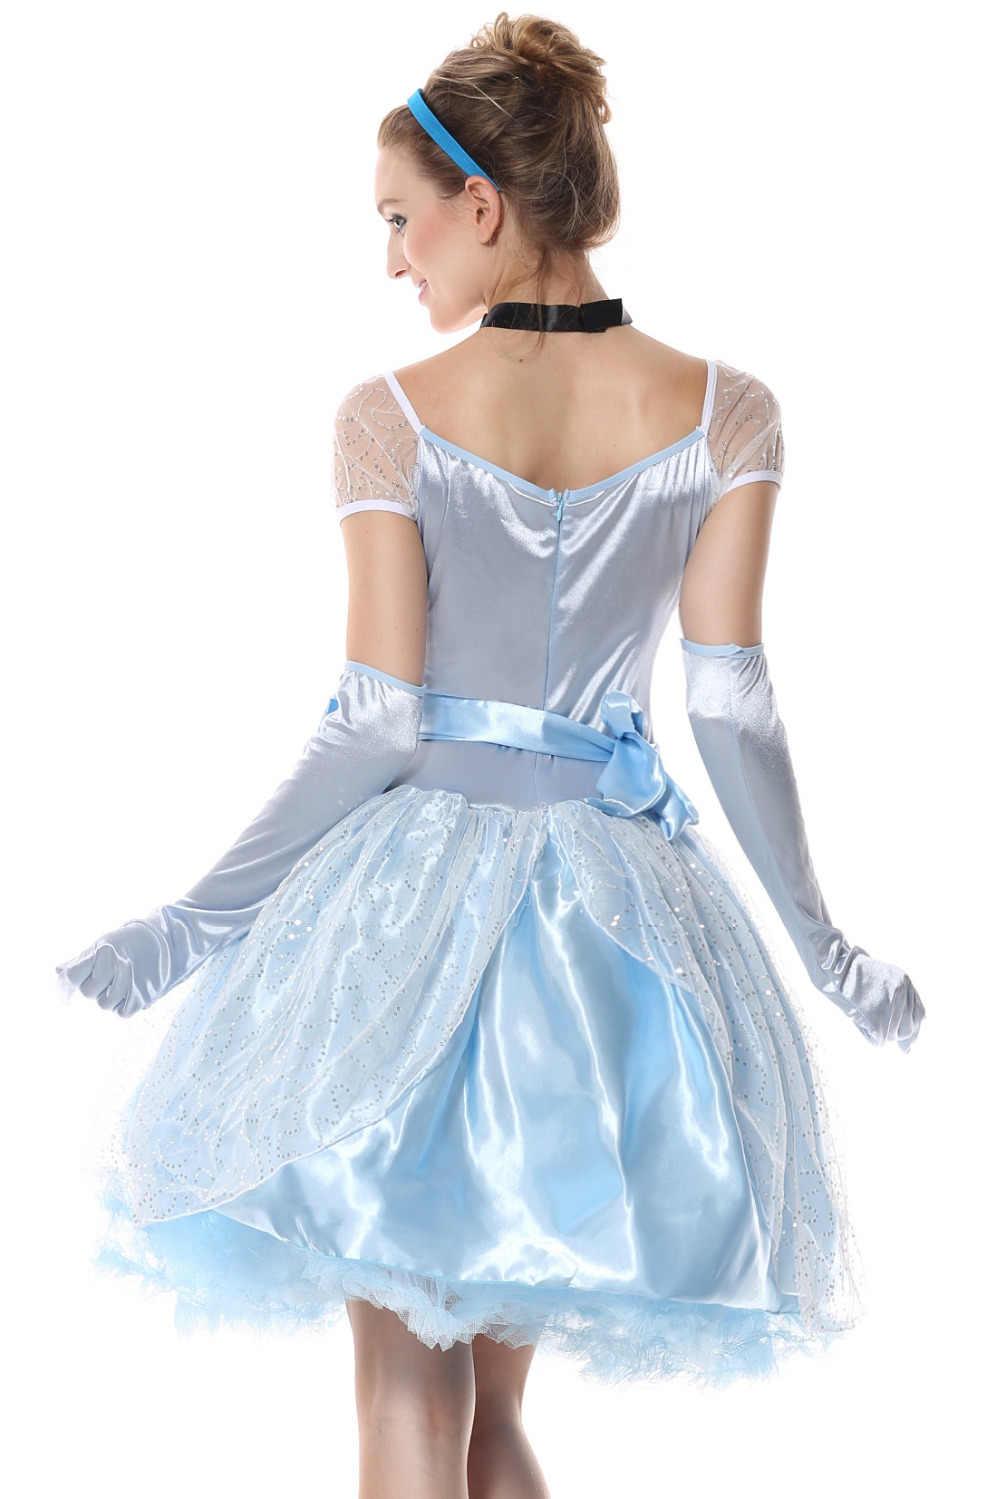 Venda quente conto de fadas princesa cinderela vestido adulto feminino halloween cinderela trajes cosplay jogo roupas